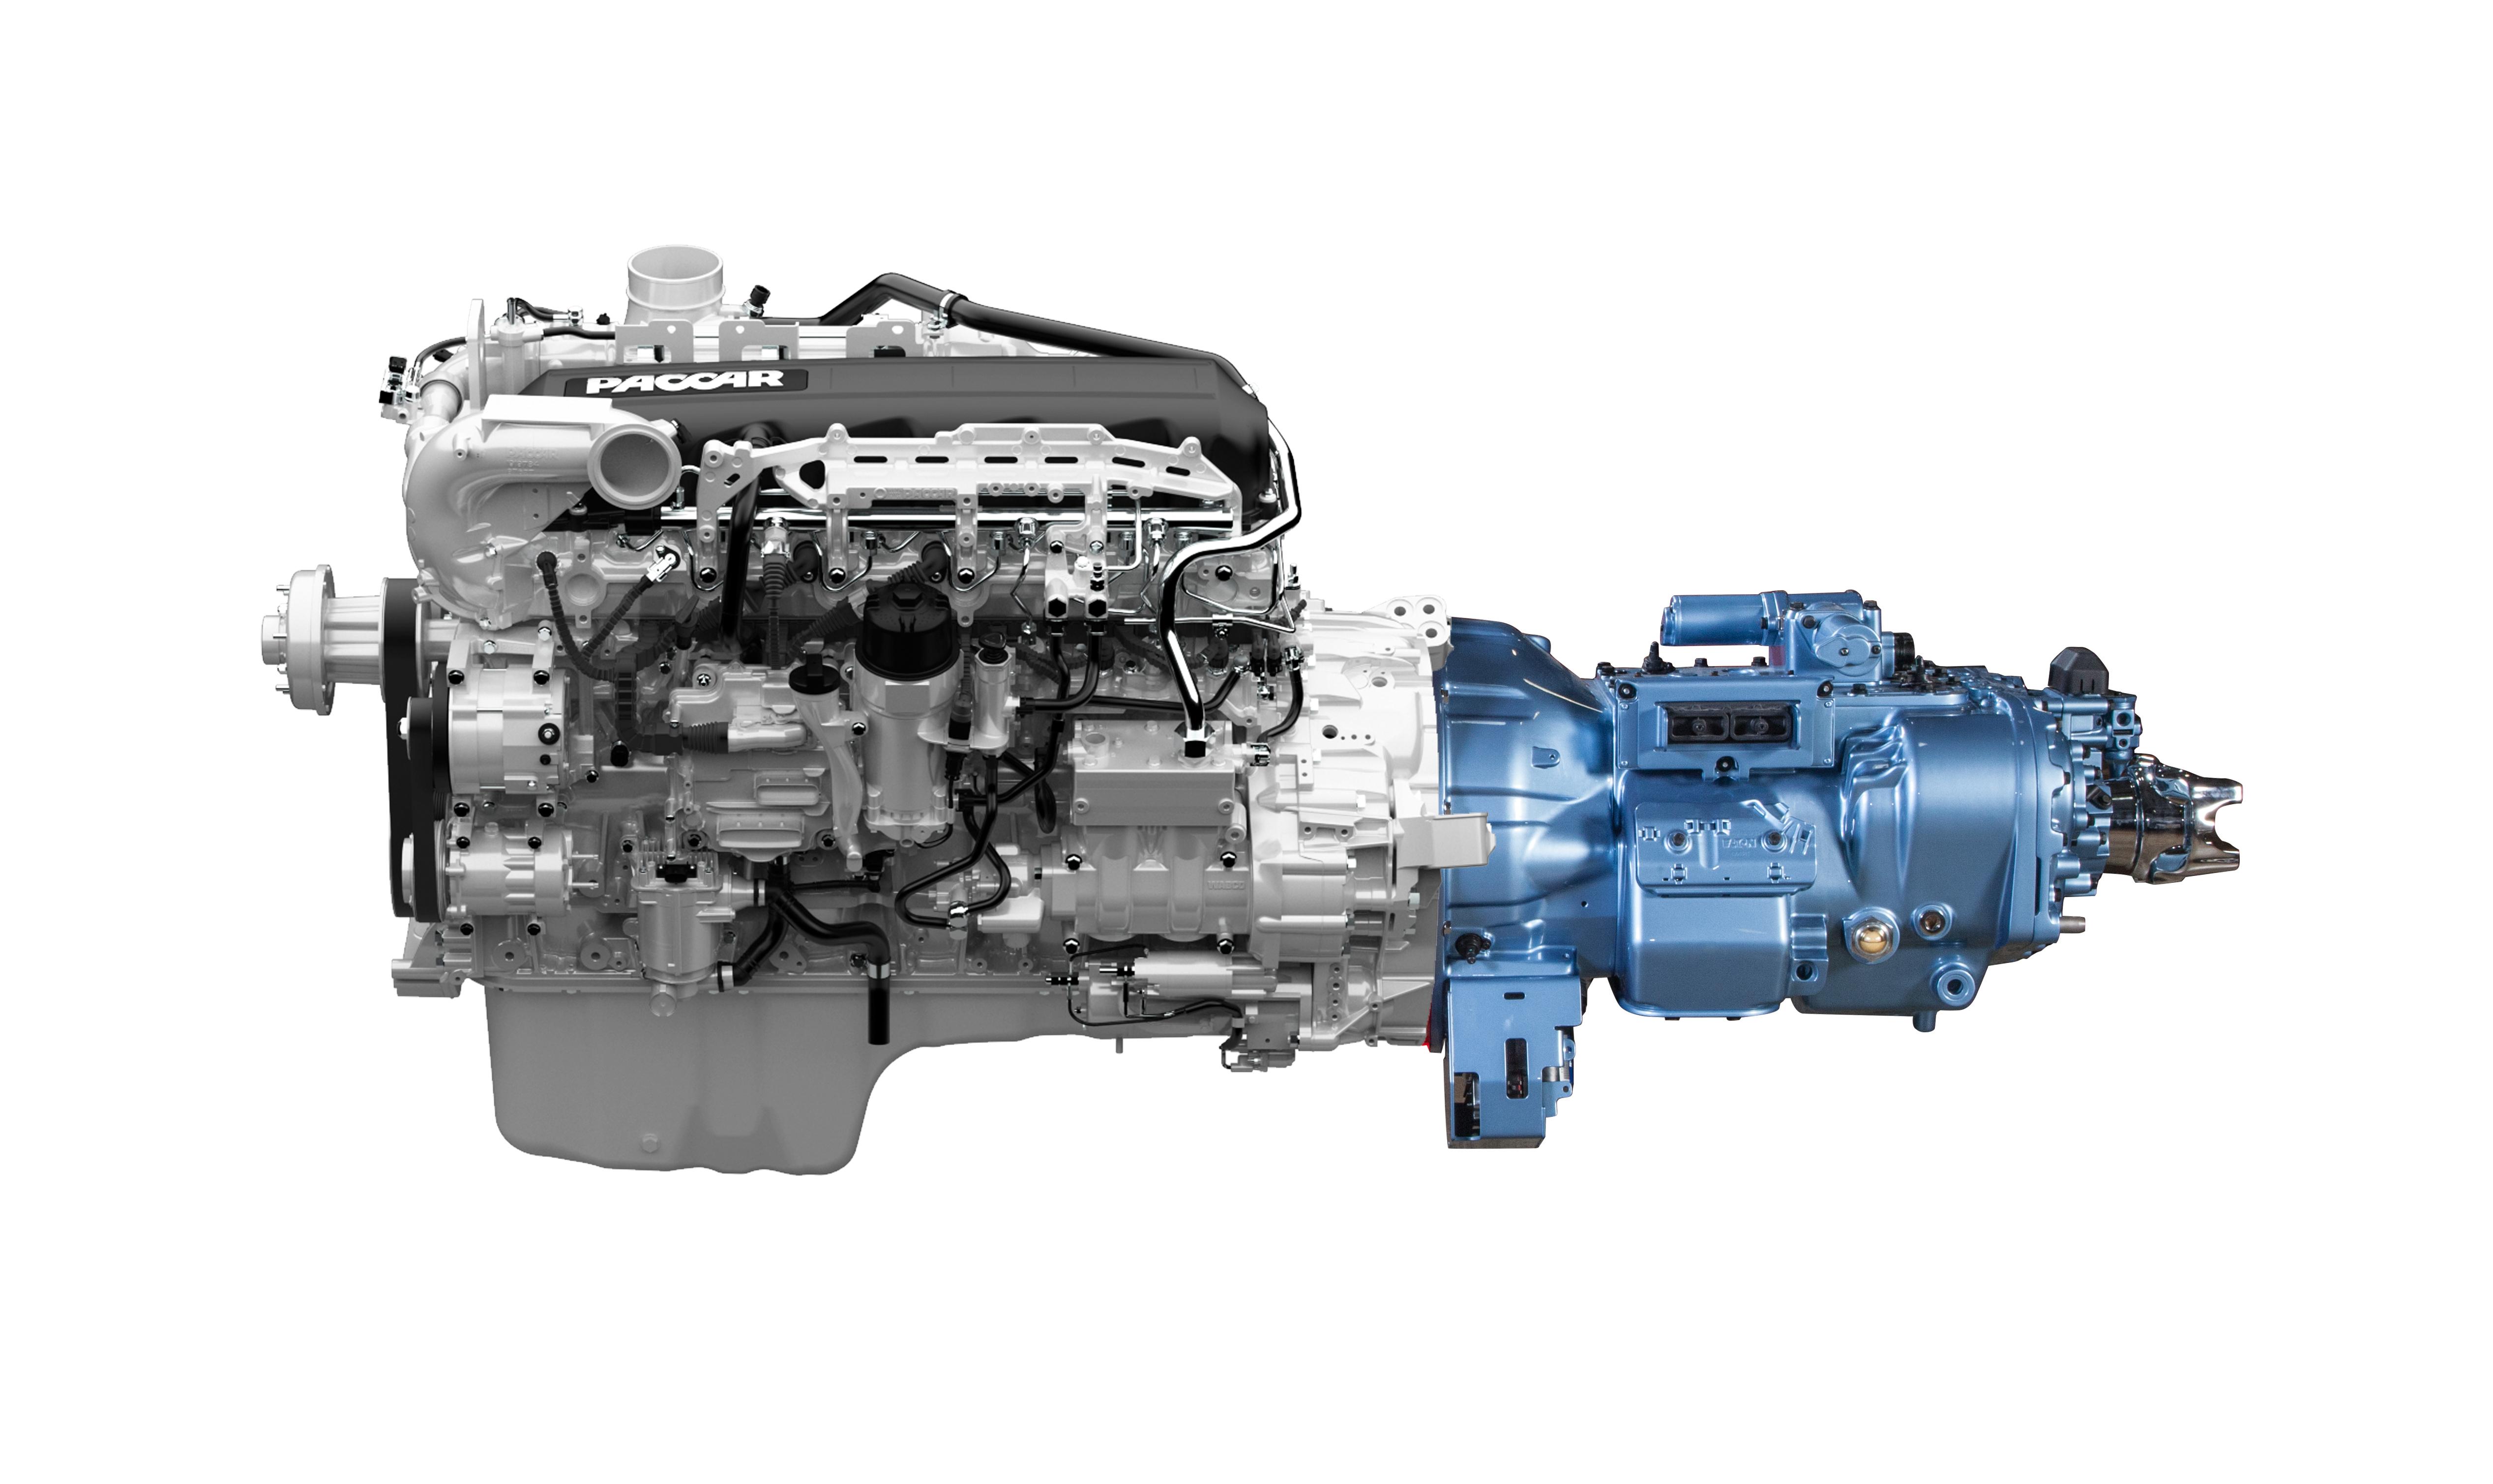 engine diagram for kenworth truck chevrolet engine diagram